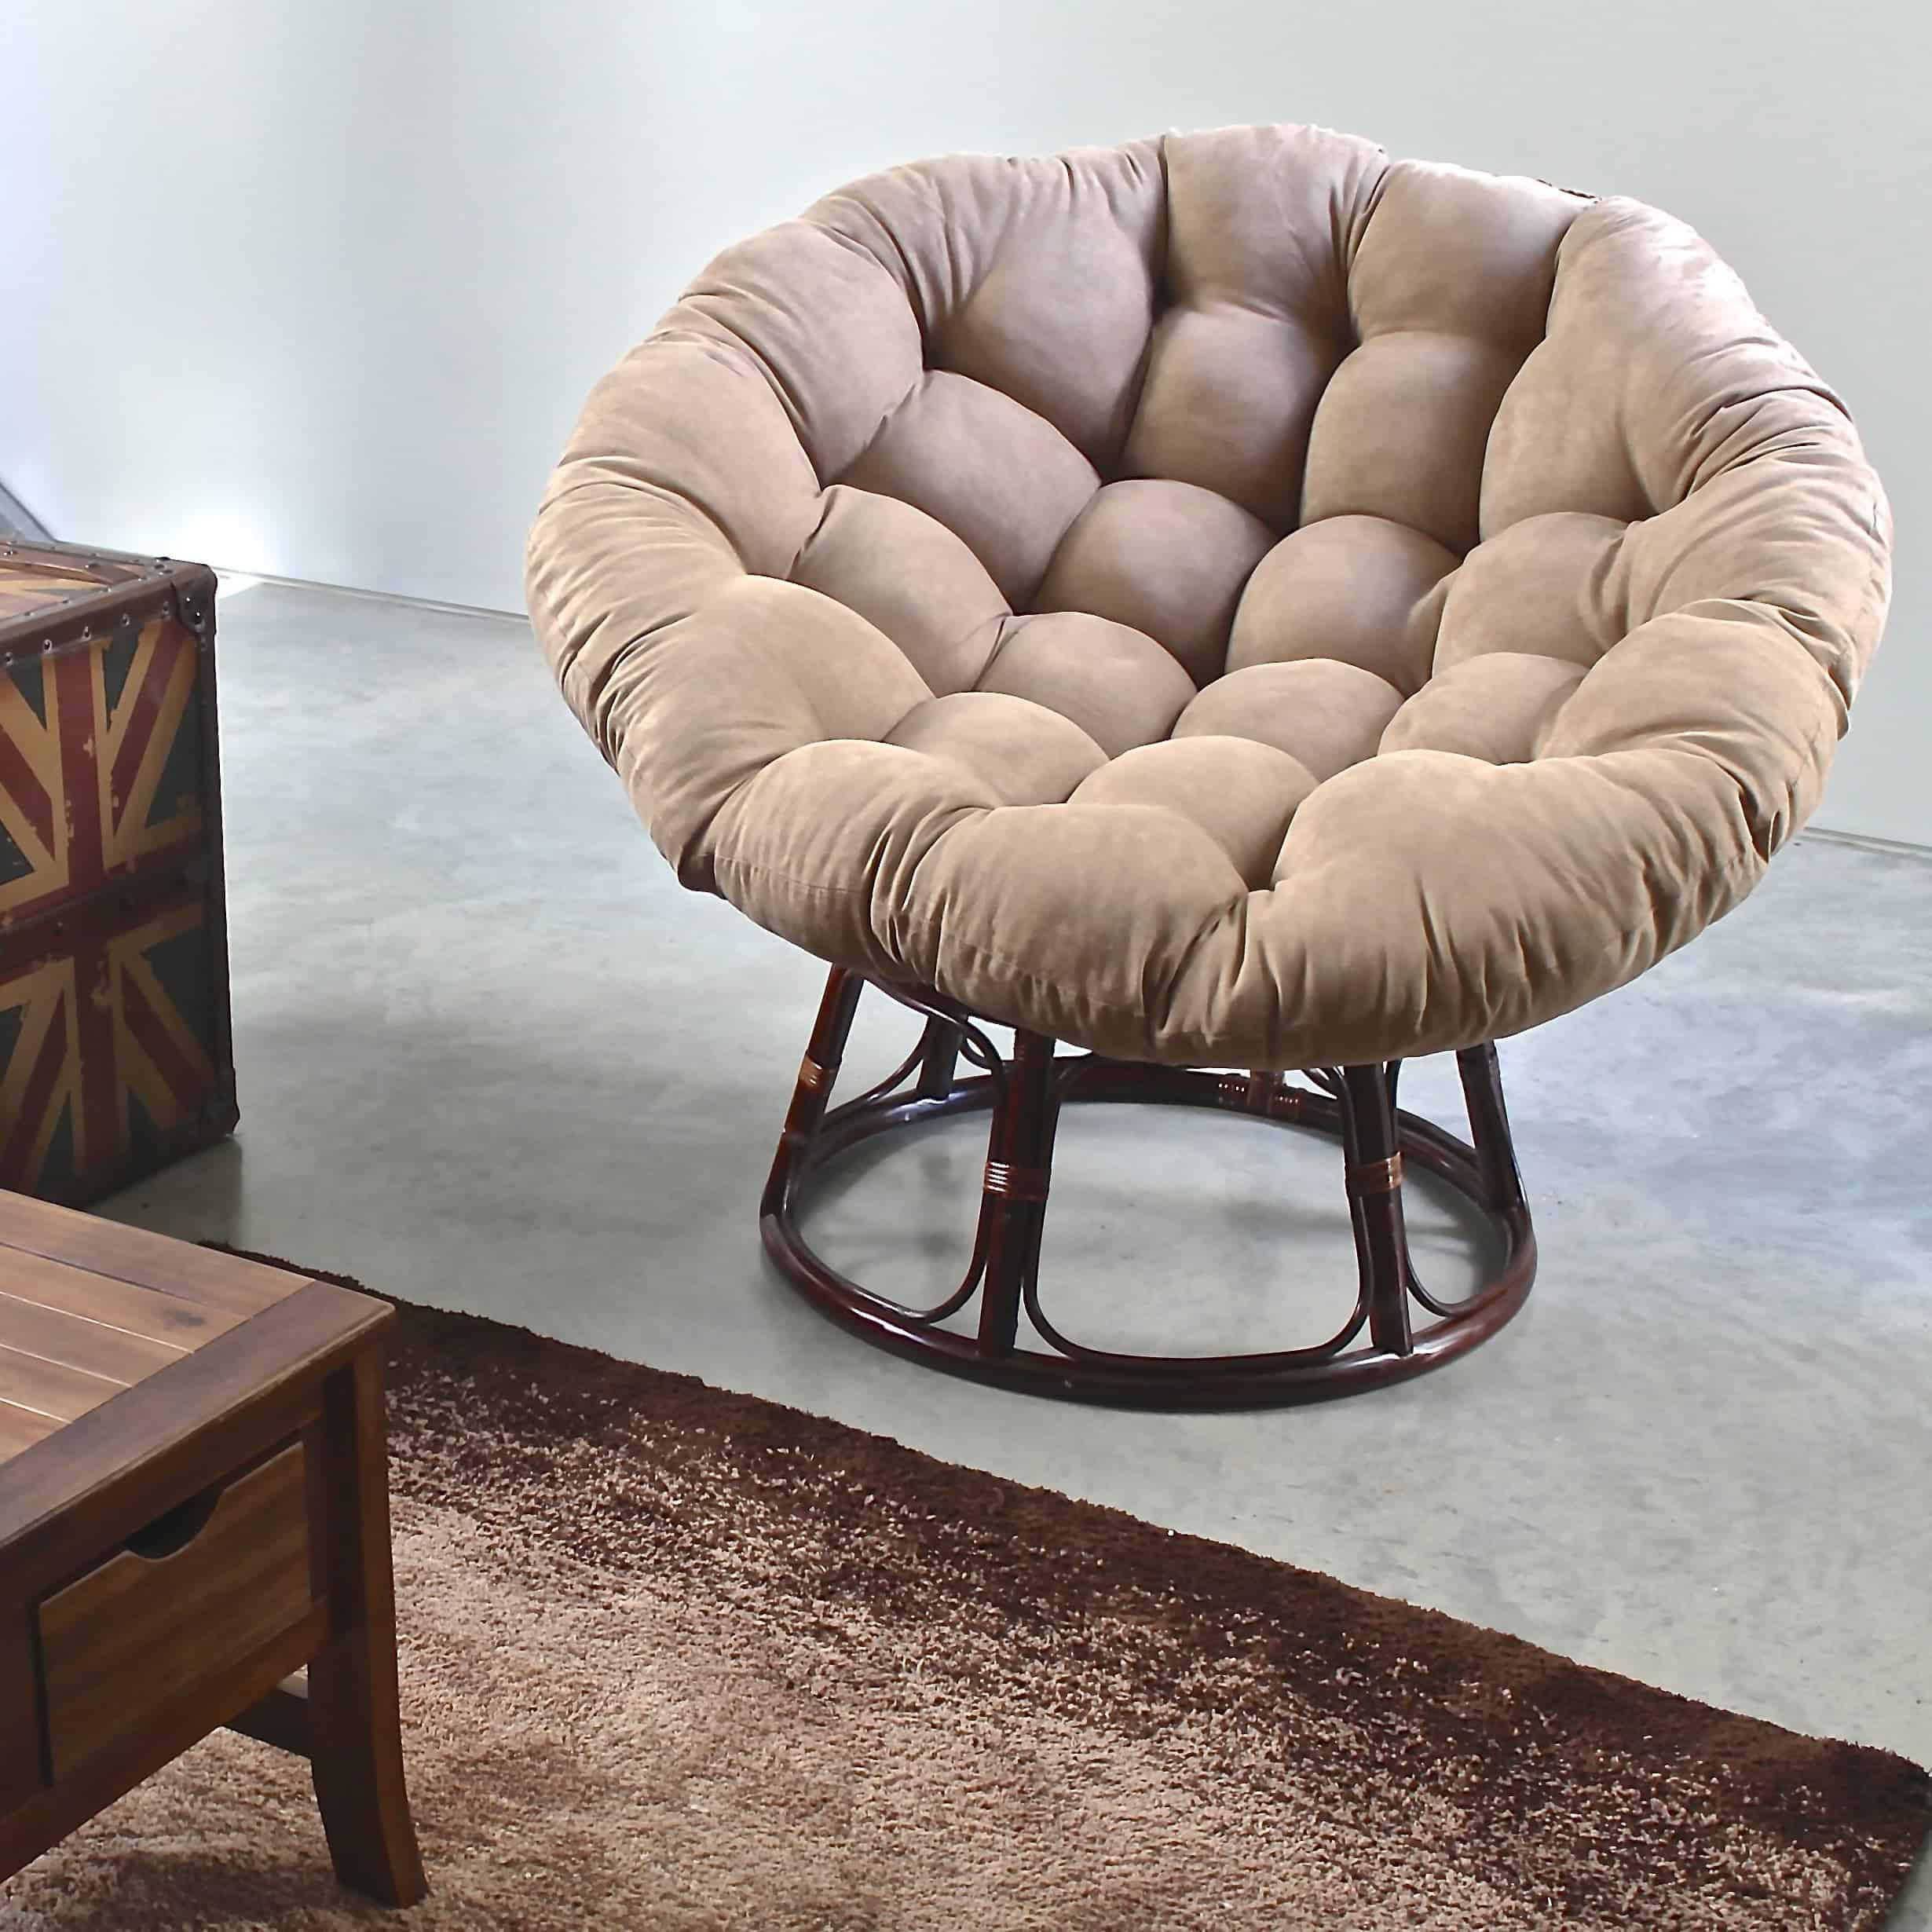 Use Papasan Chair